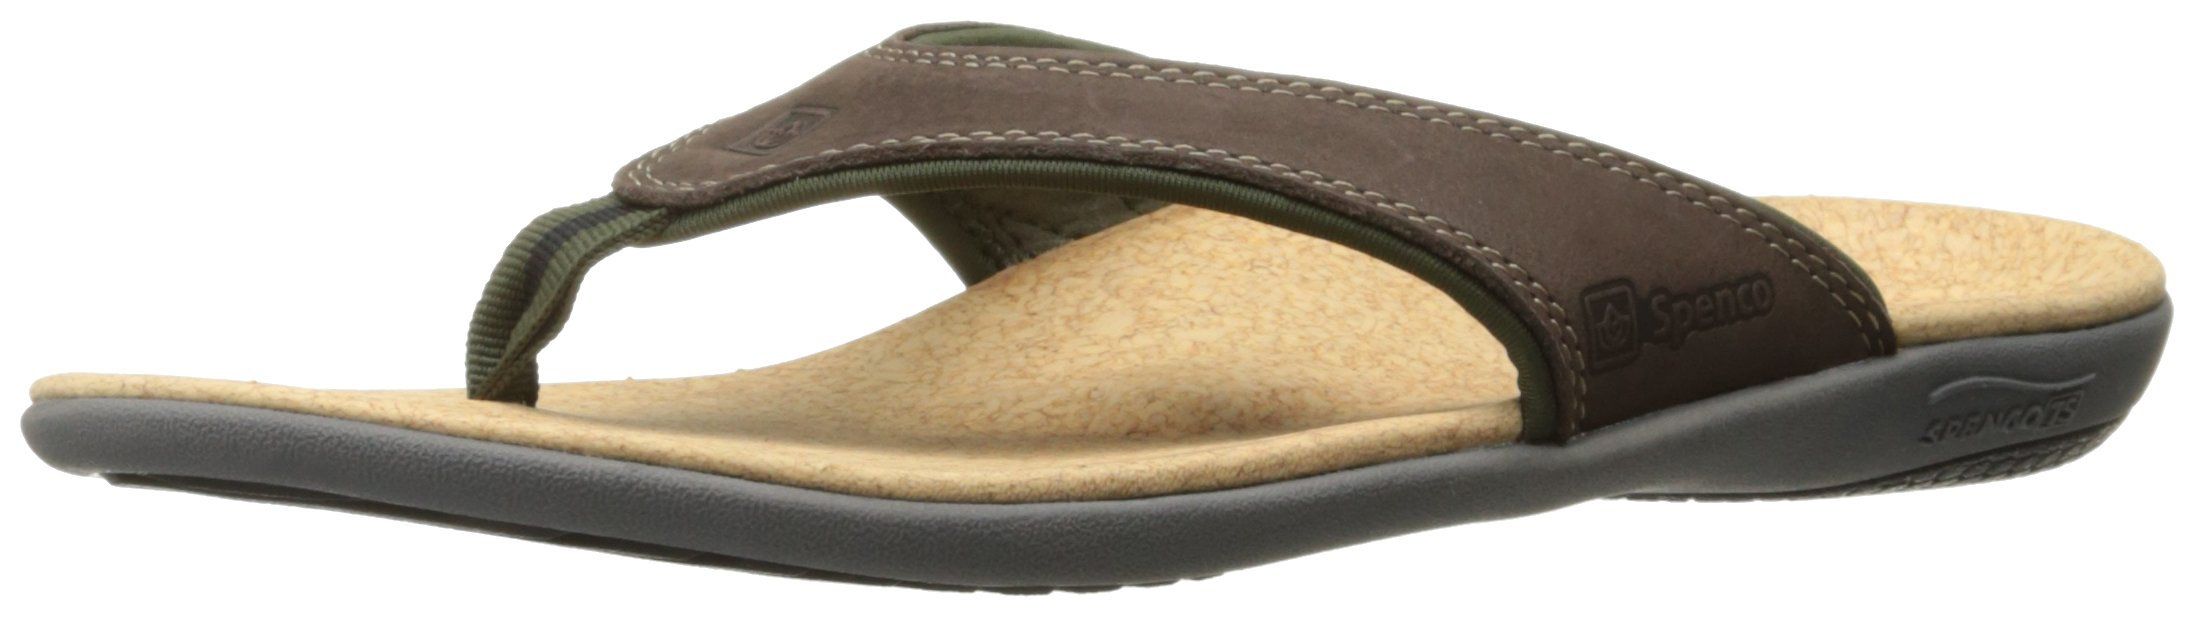 Spenco Men's Yumi Leather Sandal, Dark Brown 7M Medium US